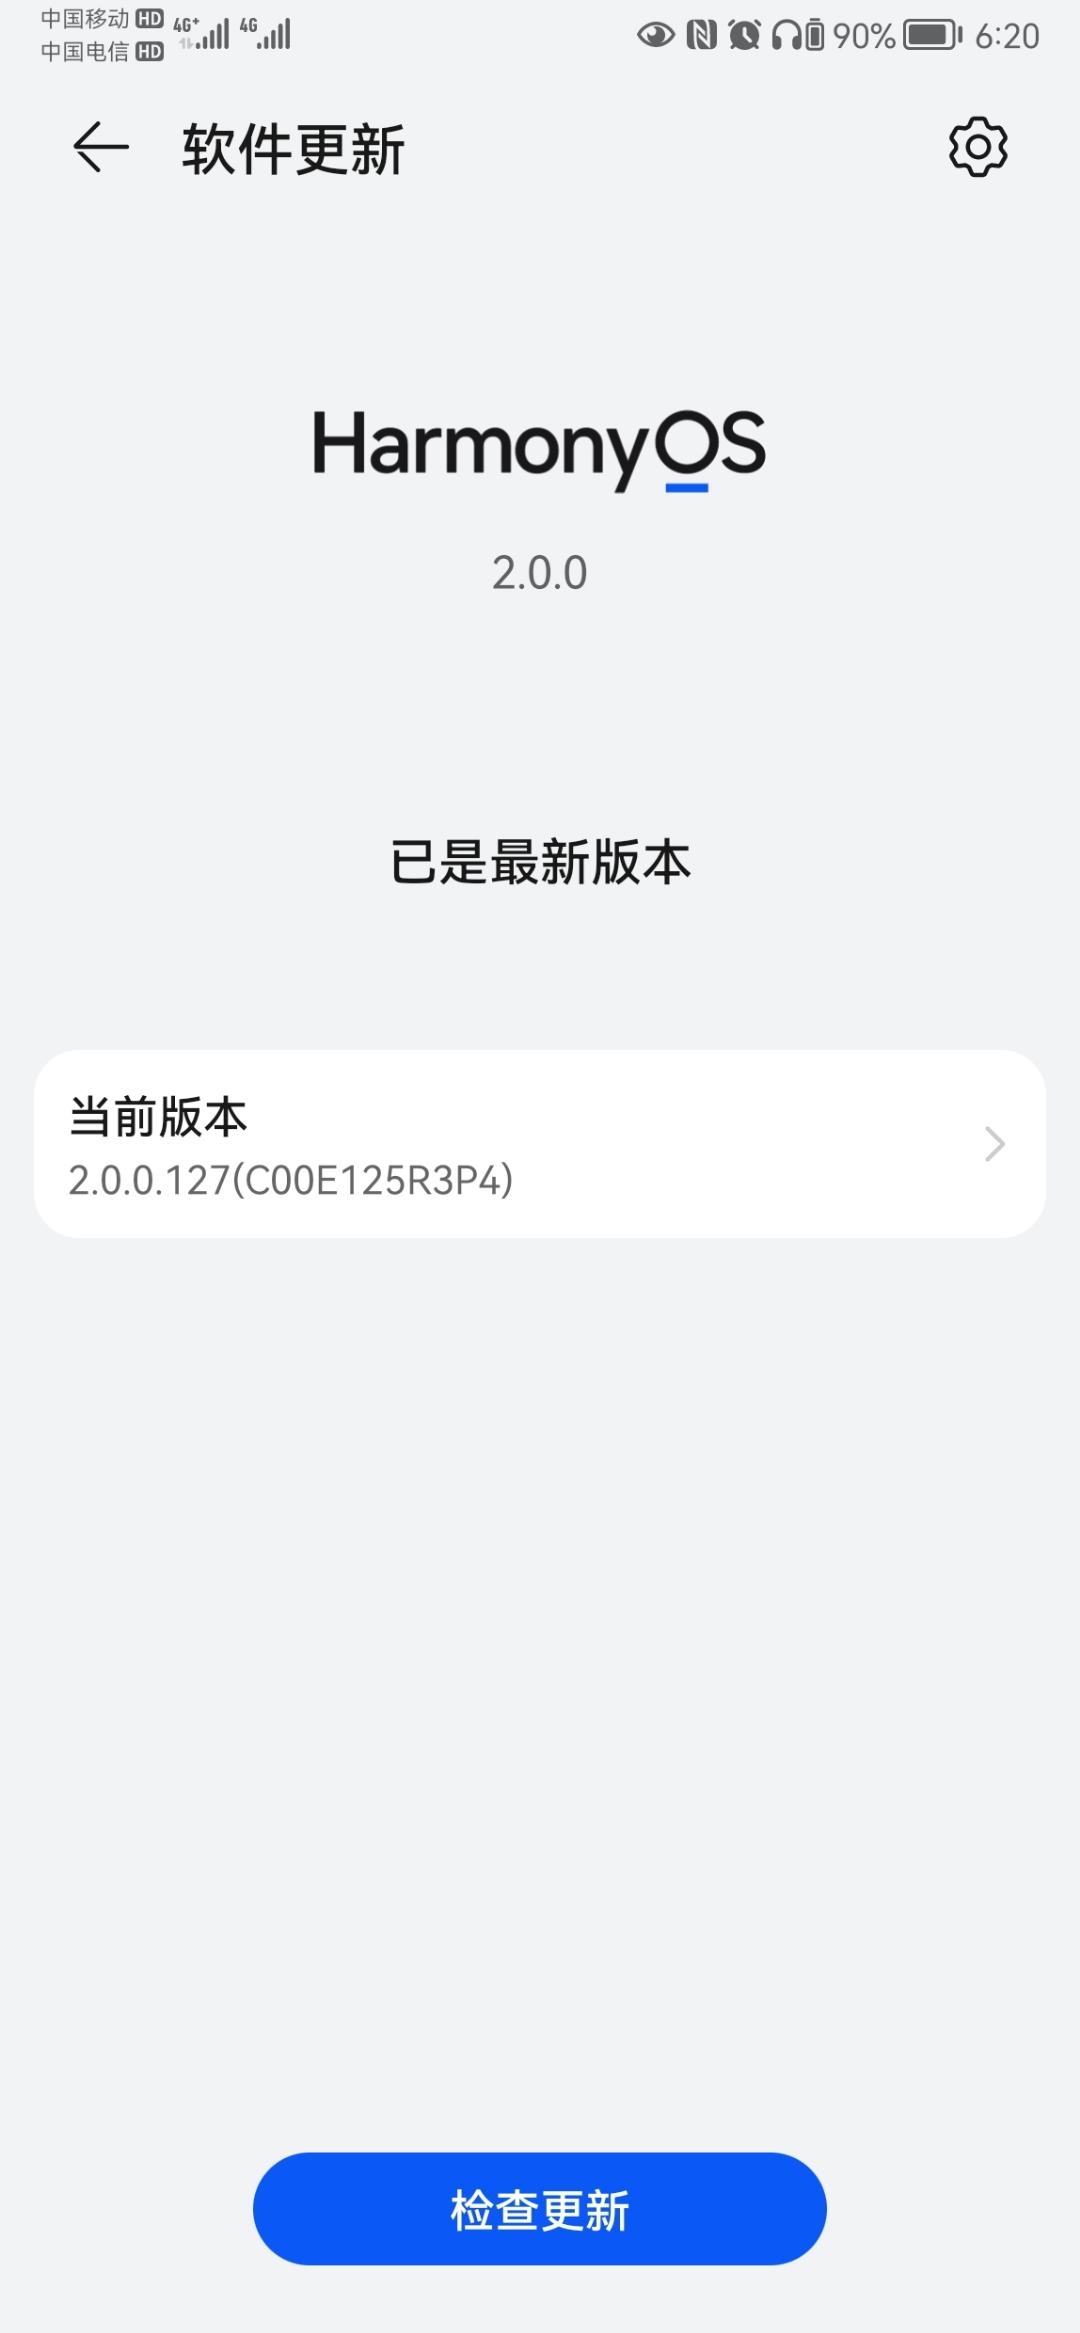 Screenshot_20210621_182017_com.huawei.android.hwouc.jpg